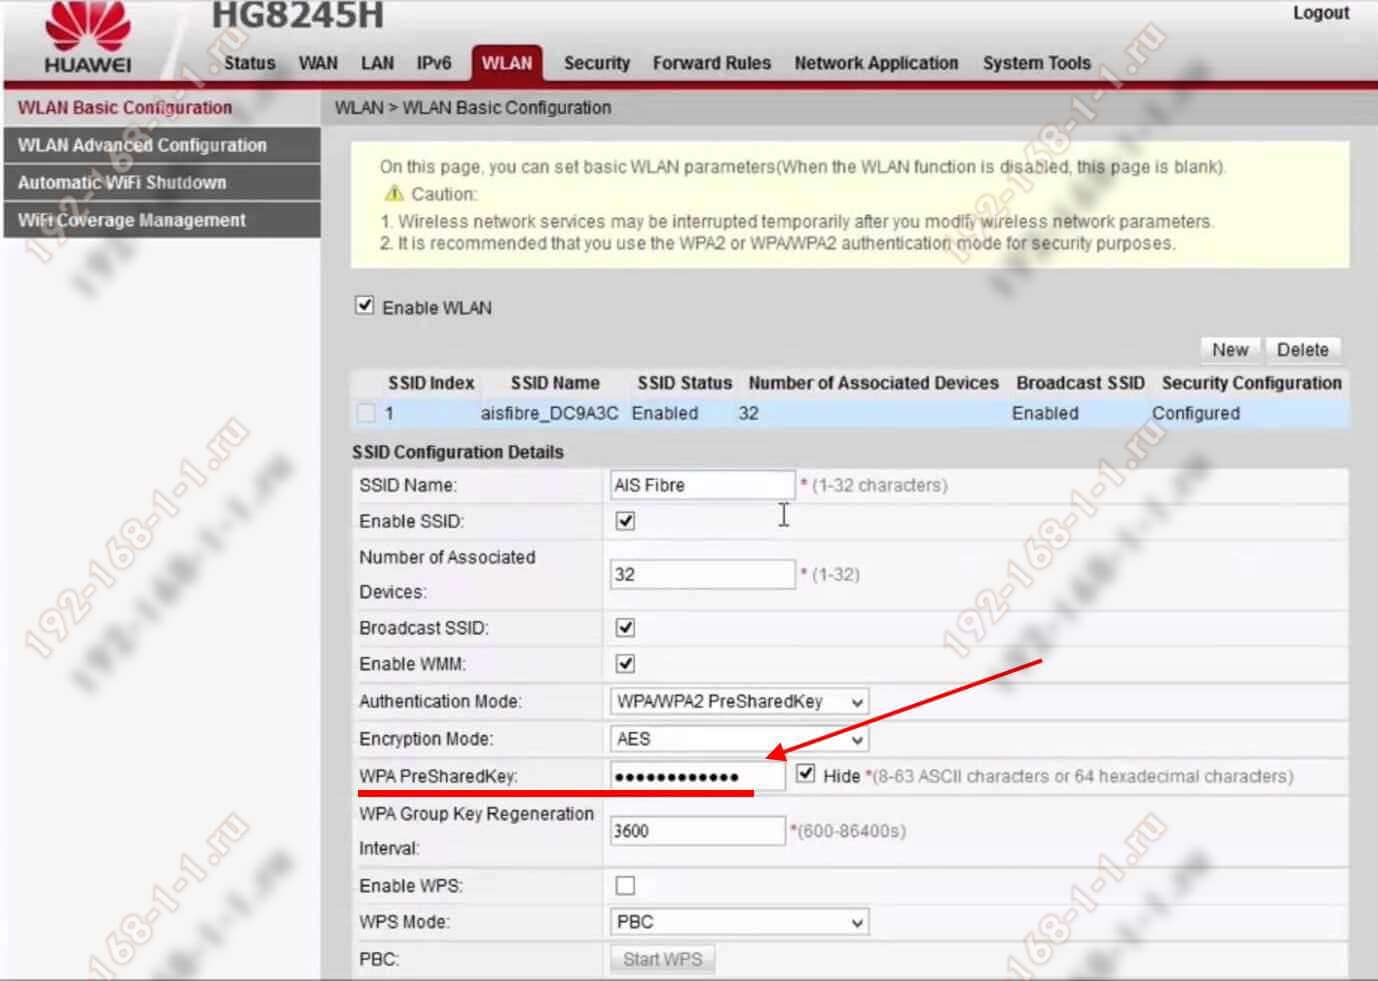 как поменять пароль на huawei hg8245 рт мгтс